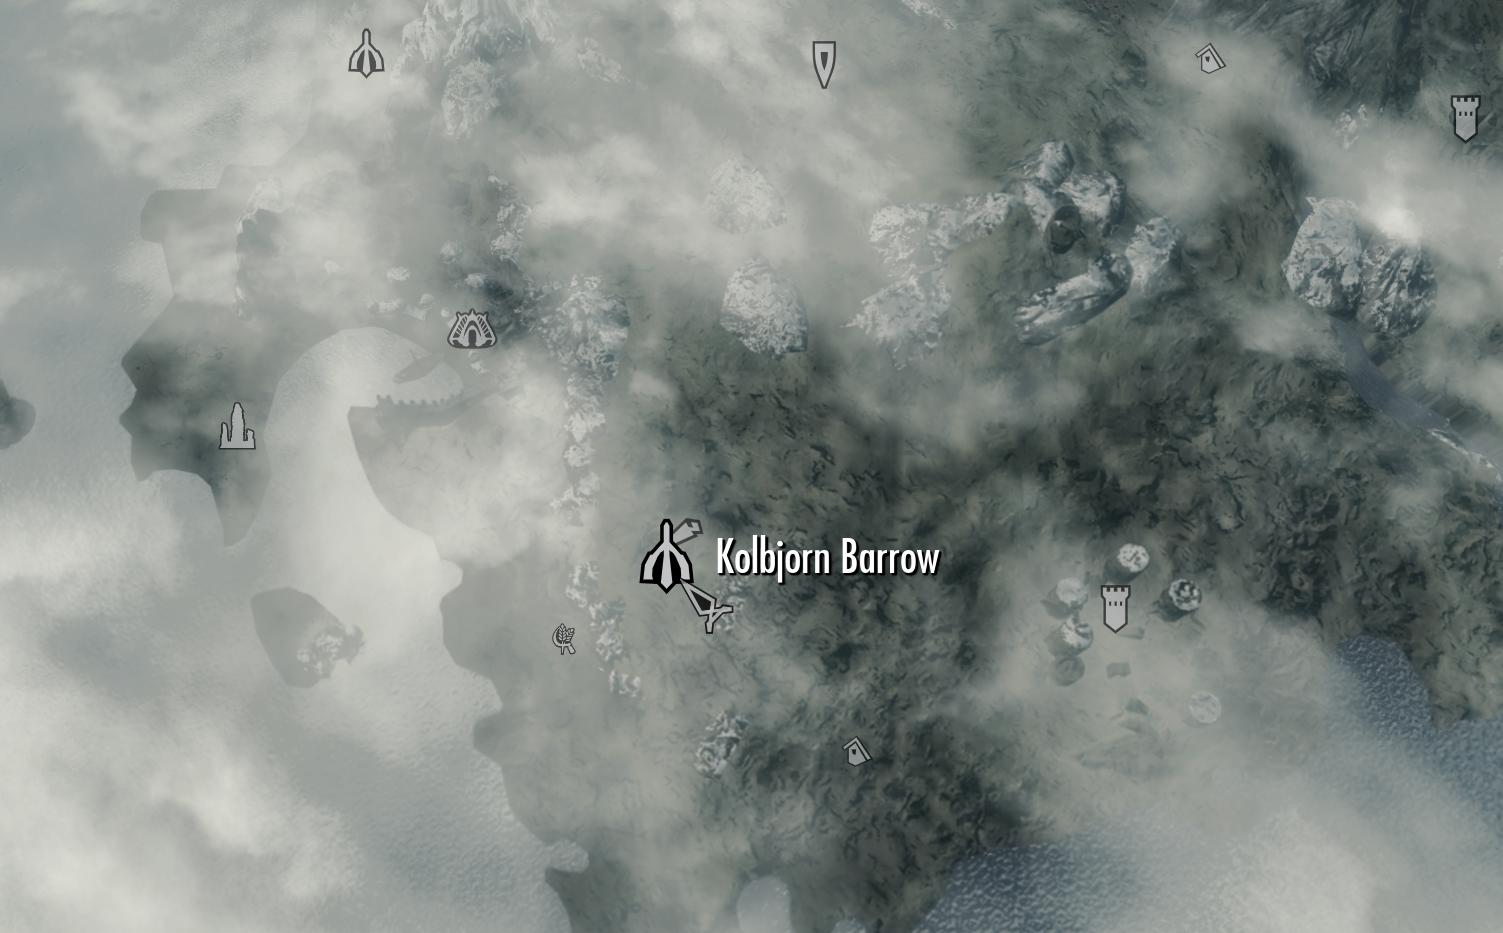 http://images.wikia.com/elderscrolls/images/7/71/Kolbjorn_Barrow_DB_Map.png